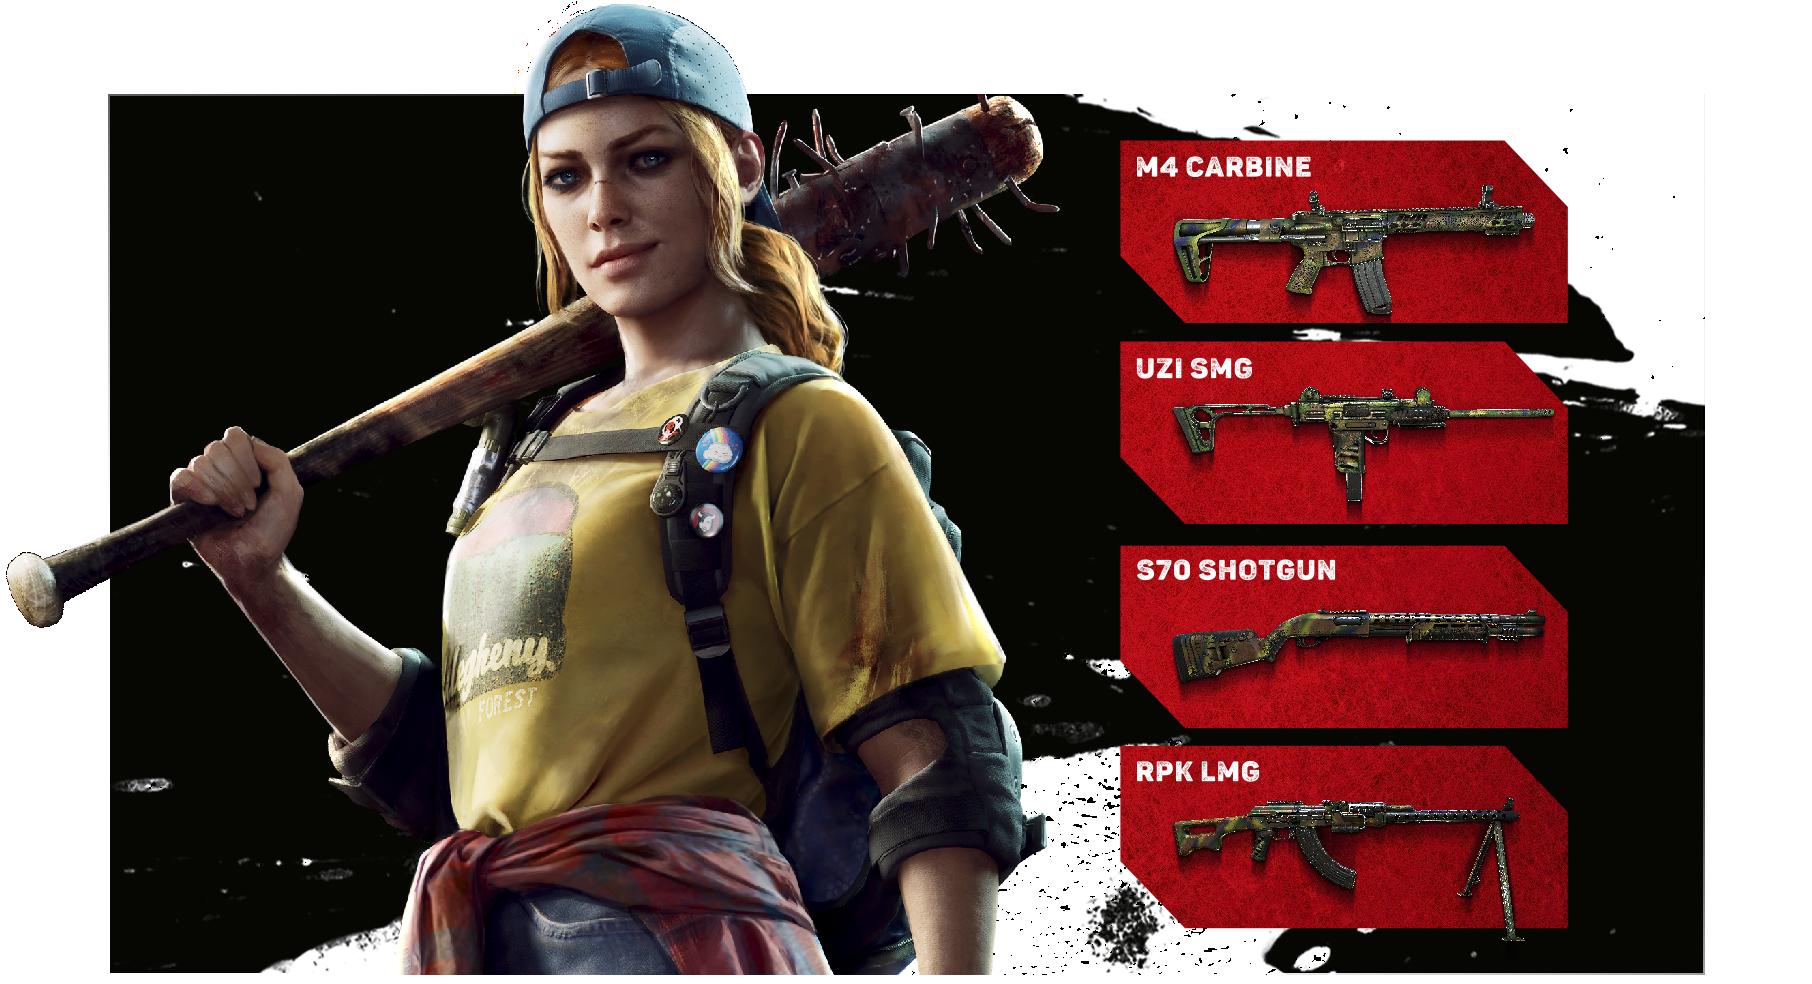 Back 4 Blood: pre-order items